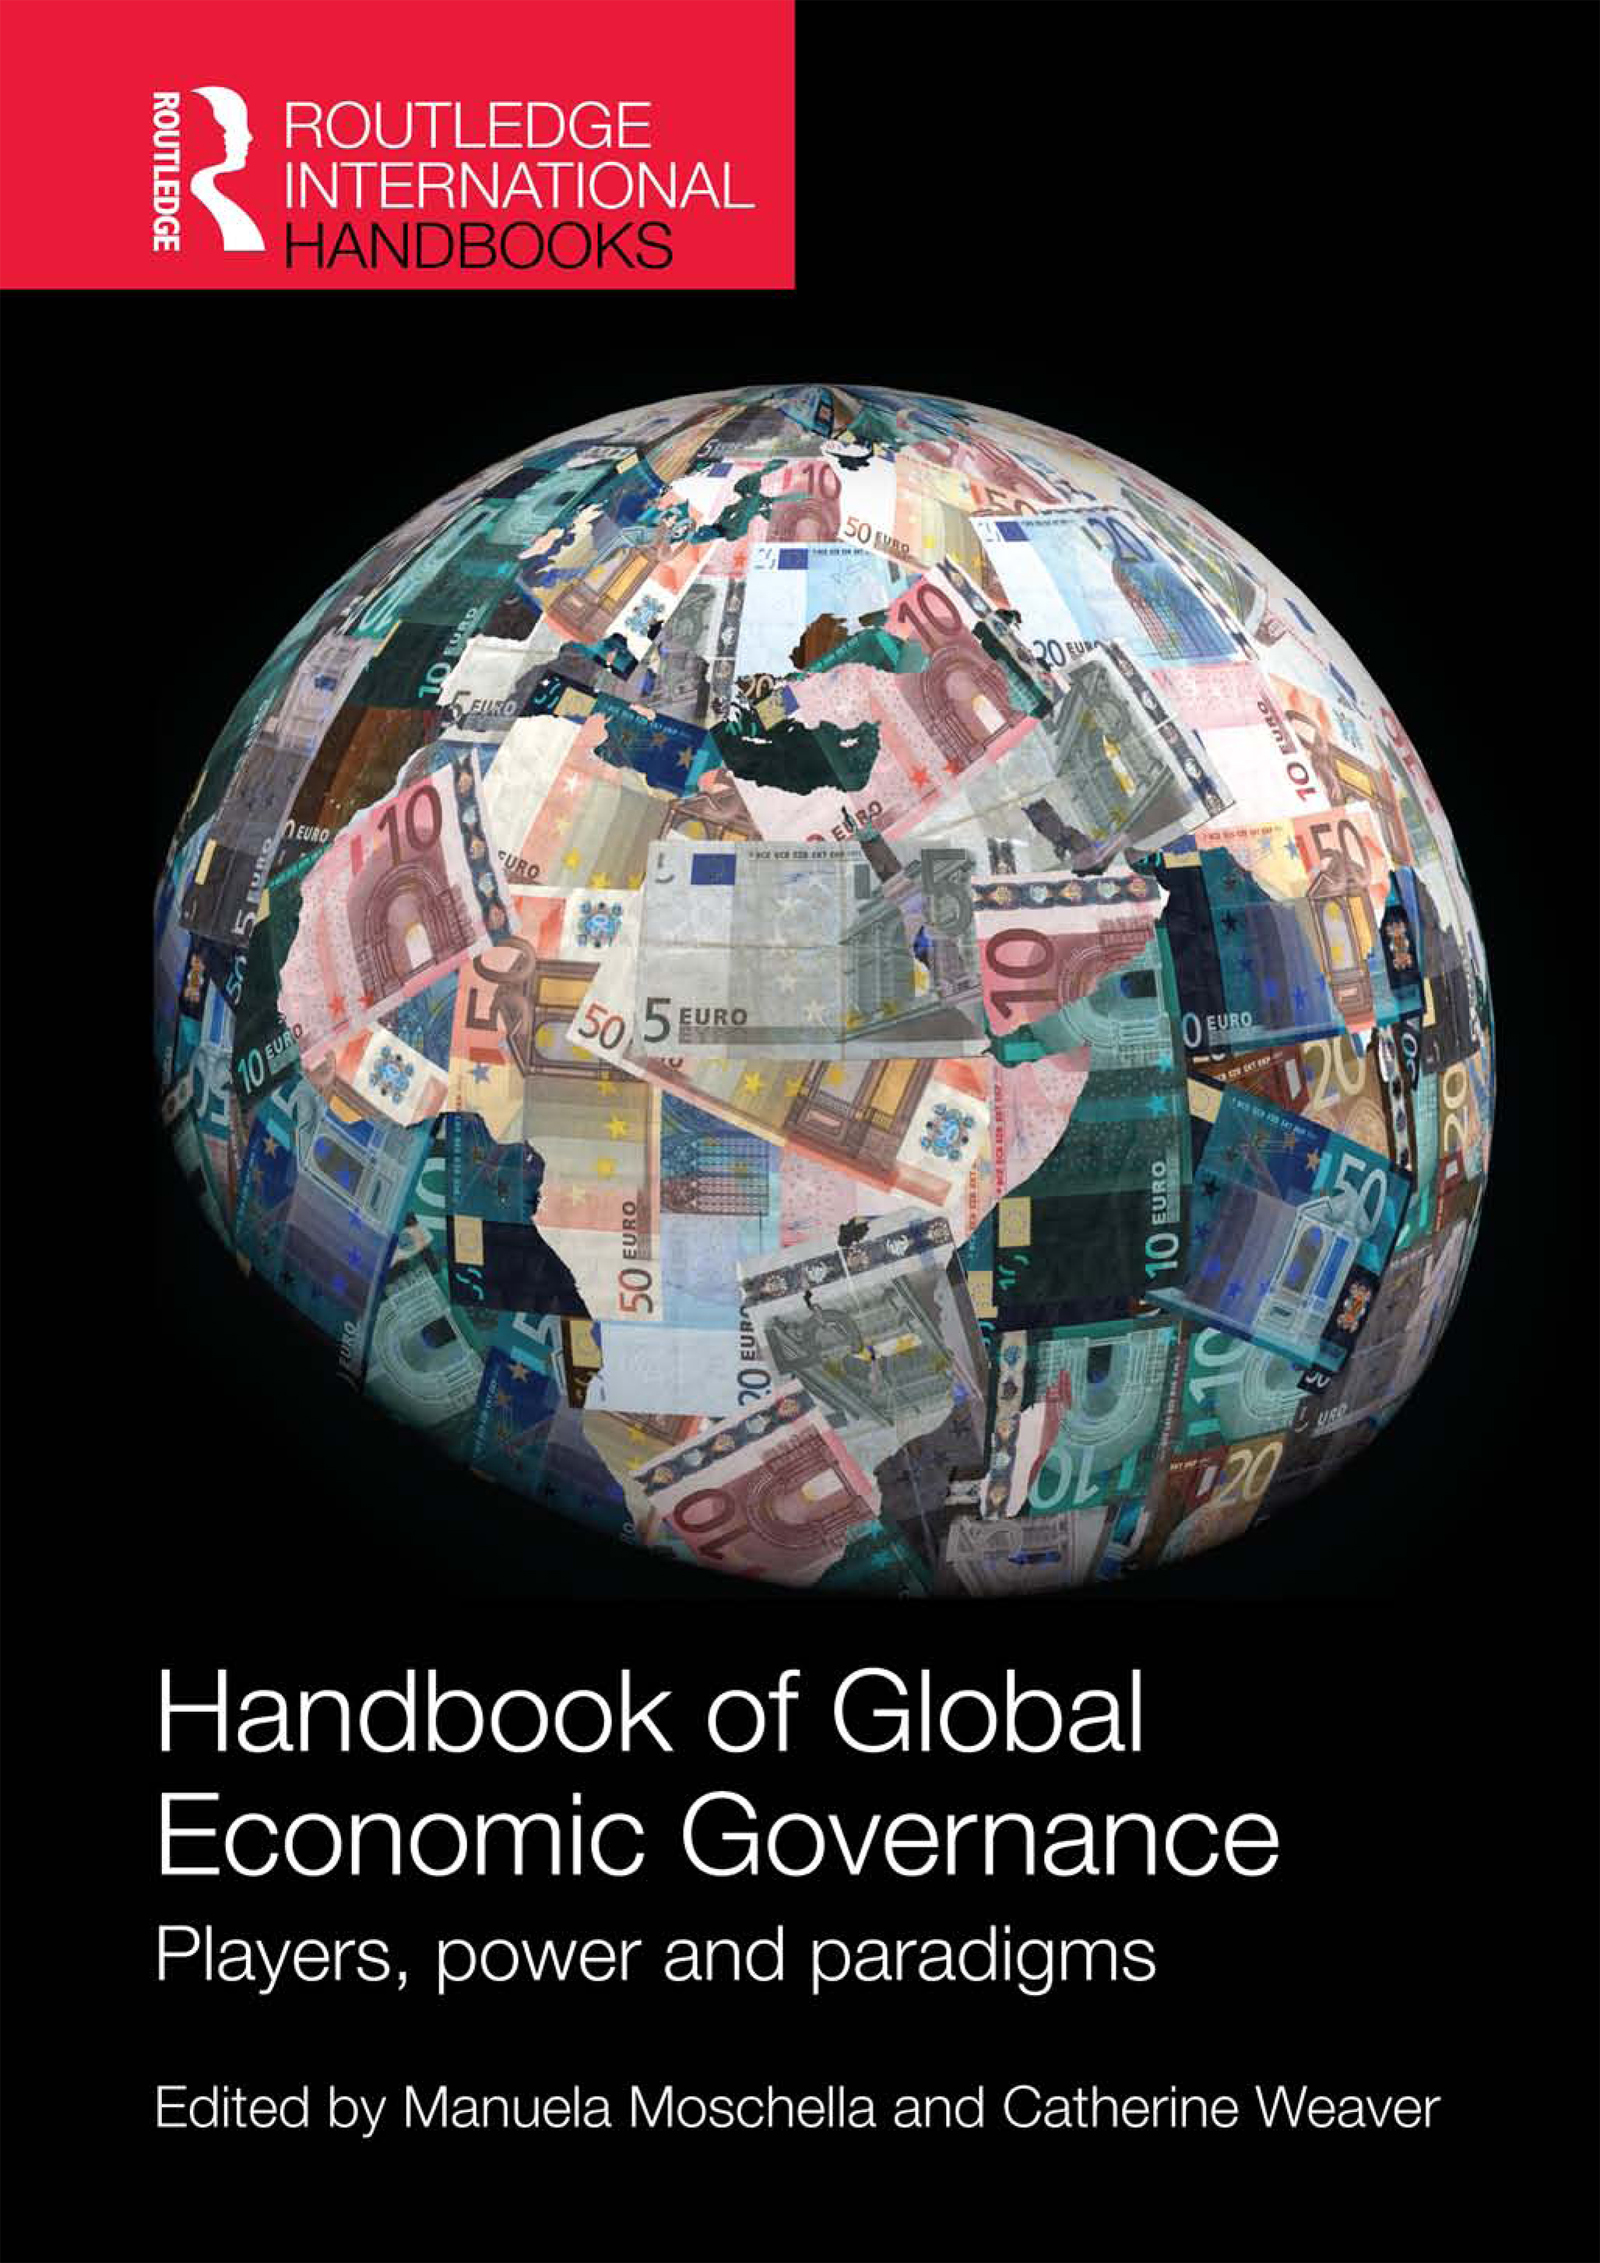 Handbook of Global Economic Governance